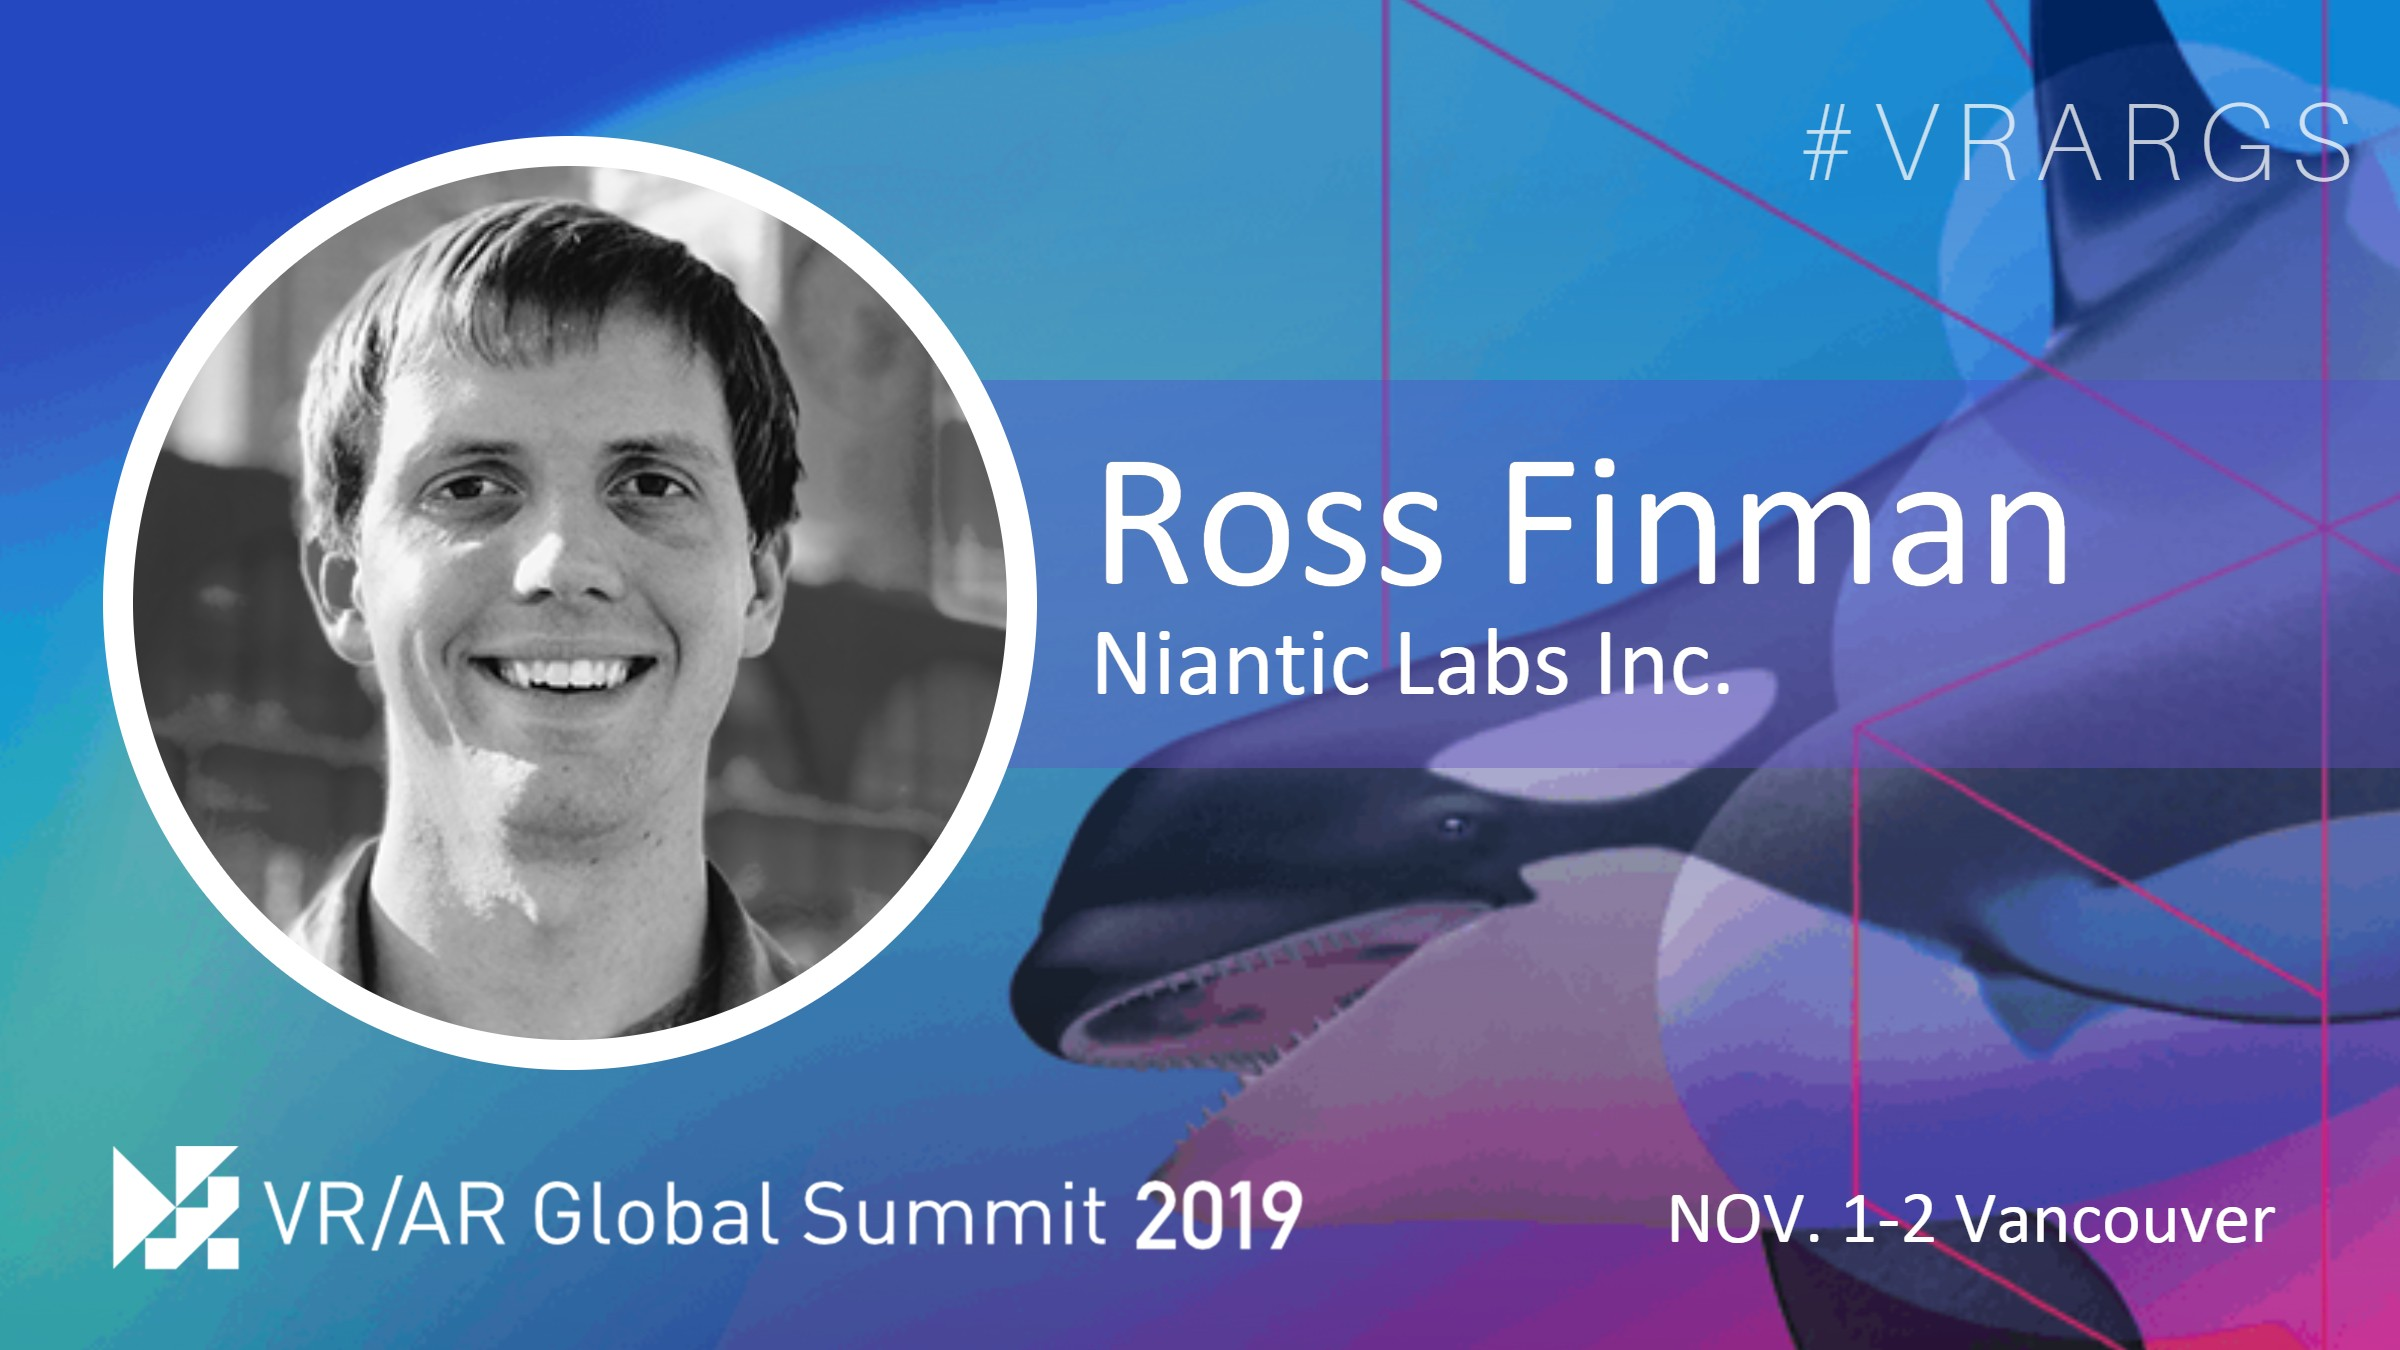 HighRes-Ross-Finman-Niantic-Labs-VRARGS-VRAR-Global-Summit-Spatial-Computing-Vancouver.jpg